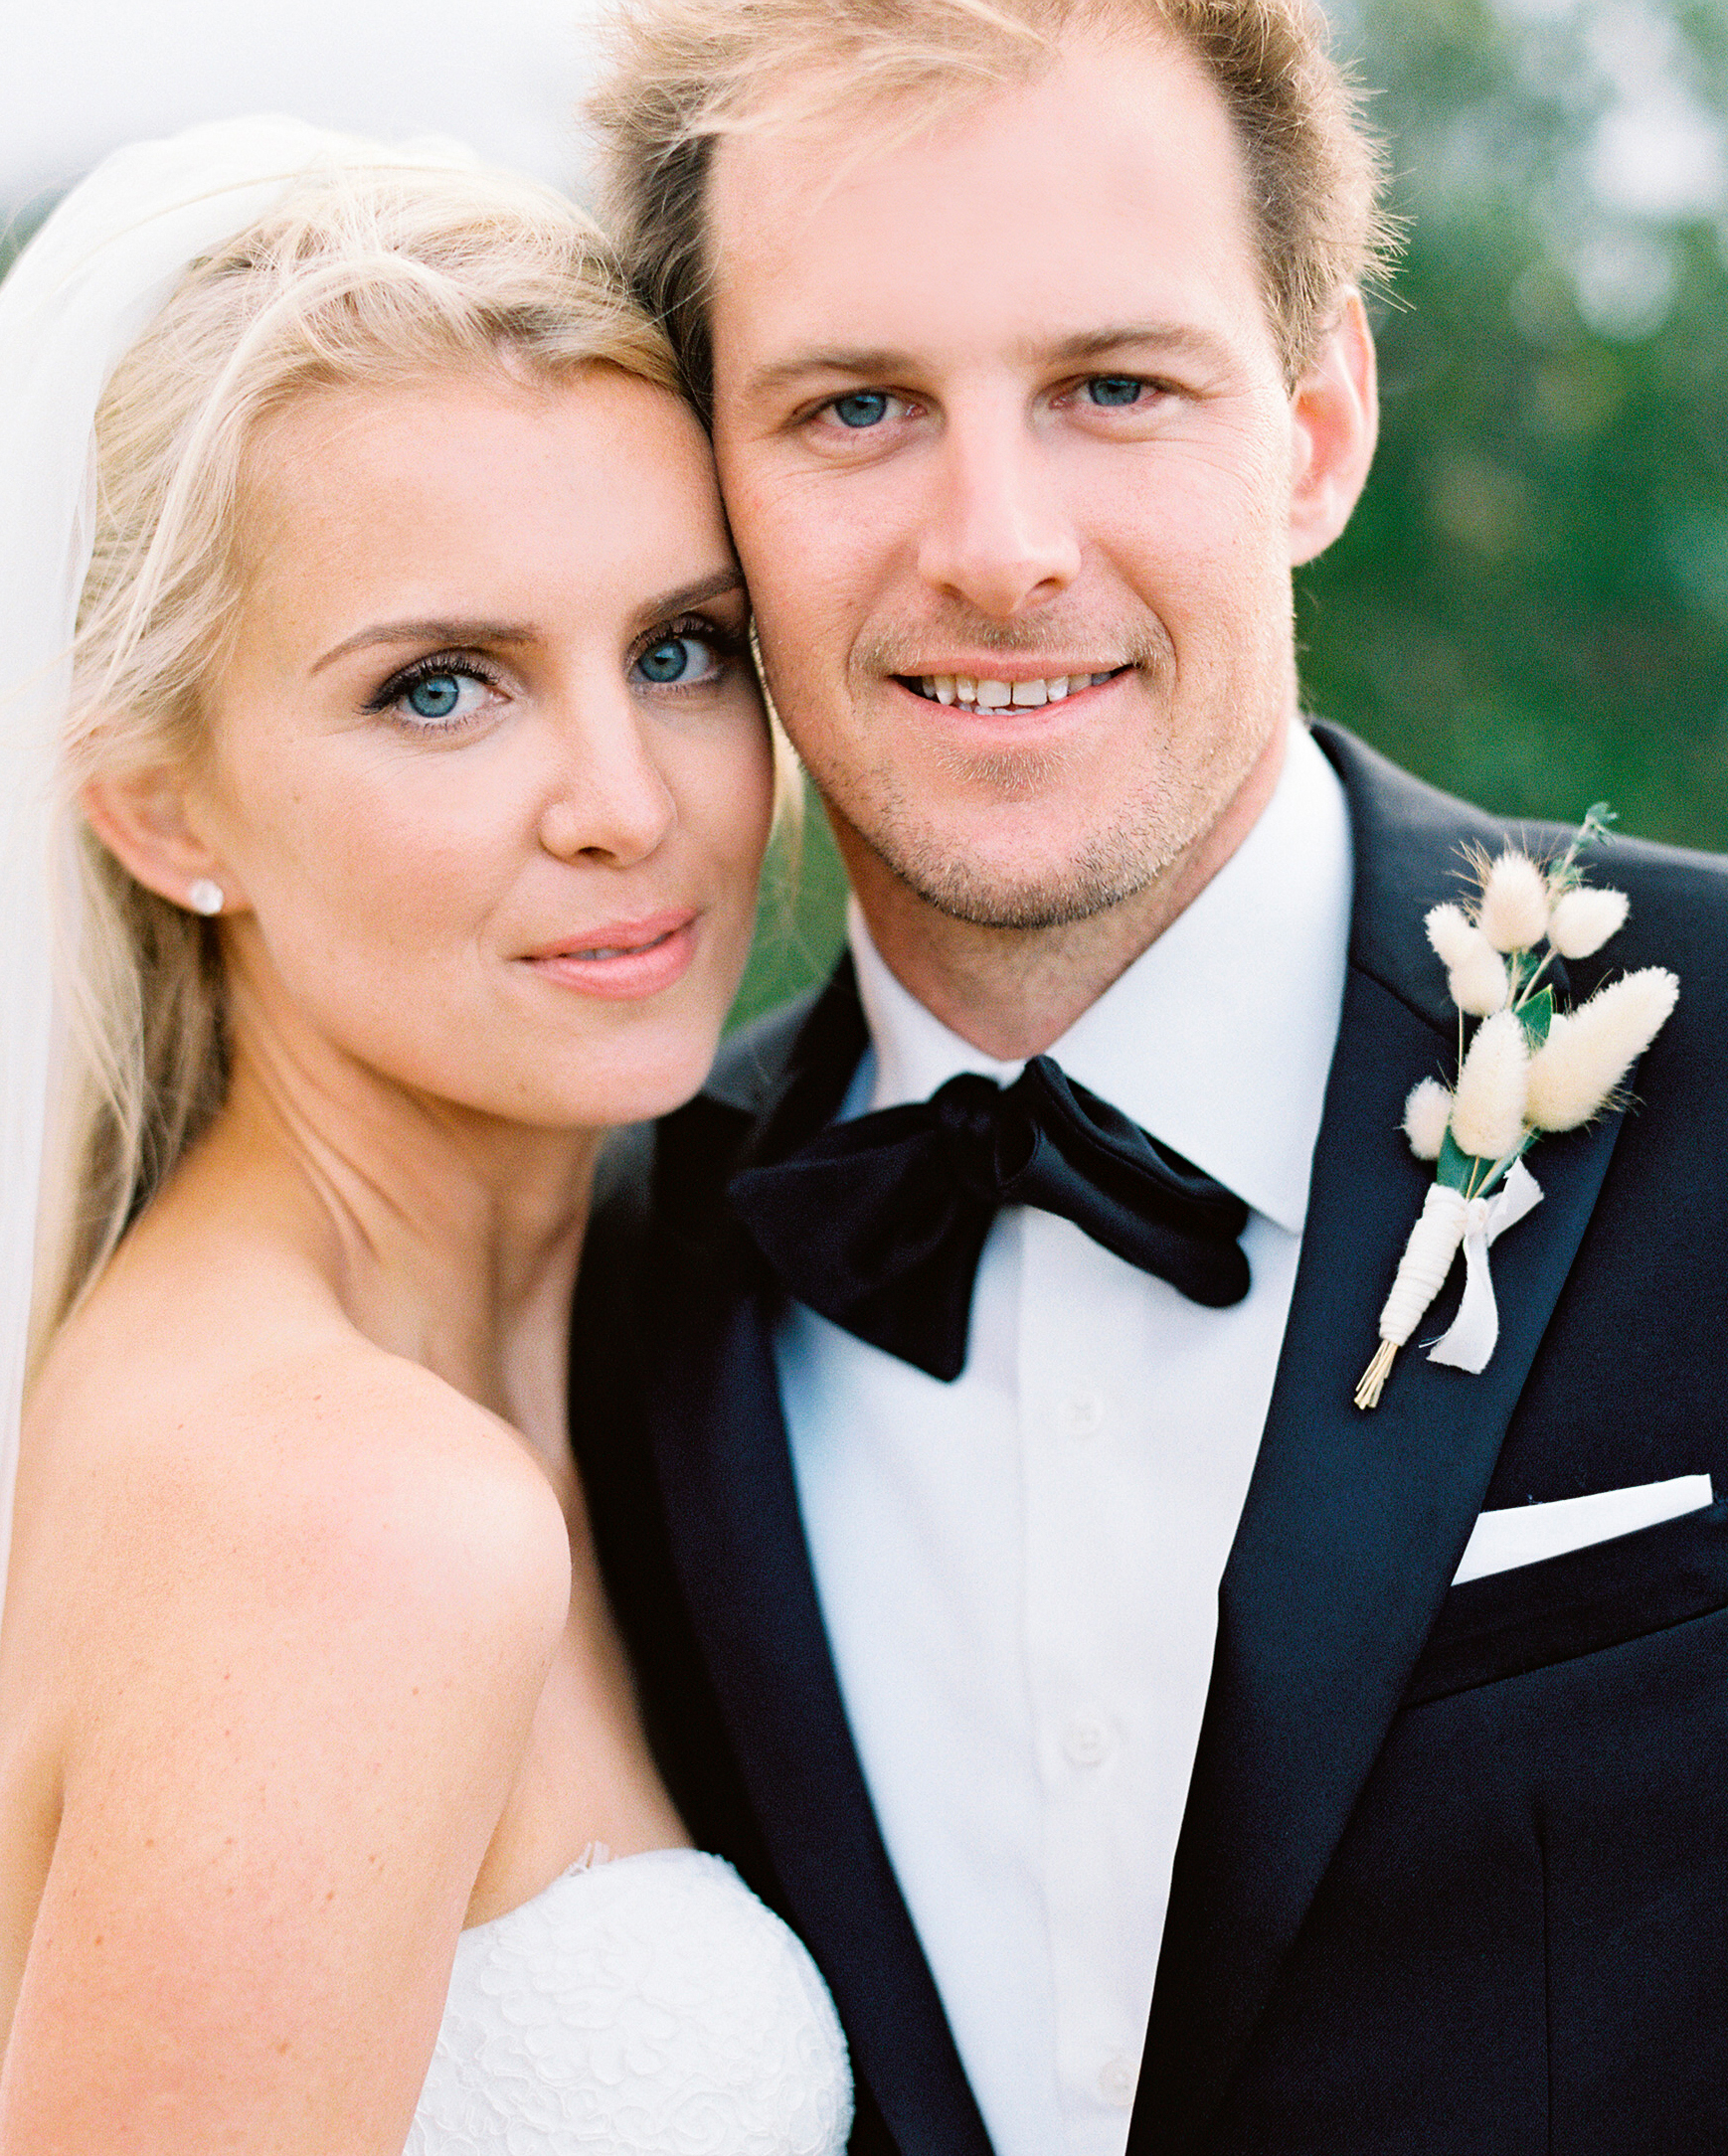 jemma-michael-wedding-couple-002577006-s112110-0815.jpg